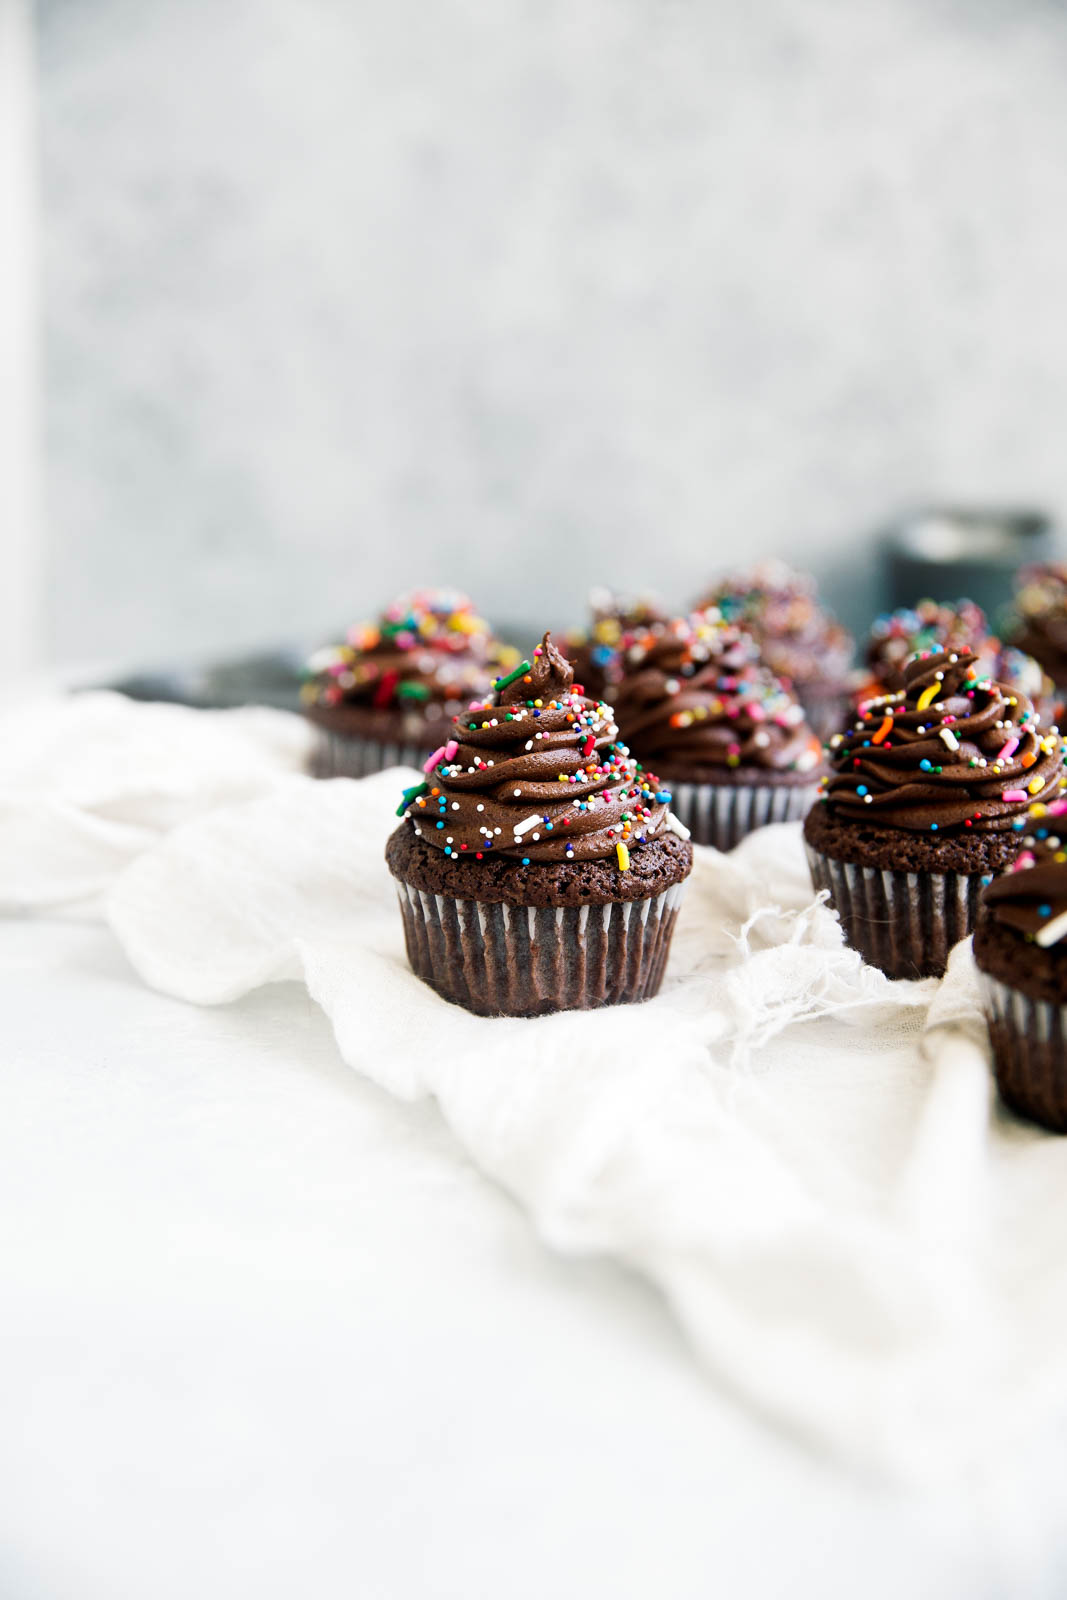 Chocolate Brownie Cupcakes on towel